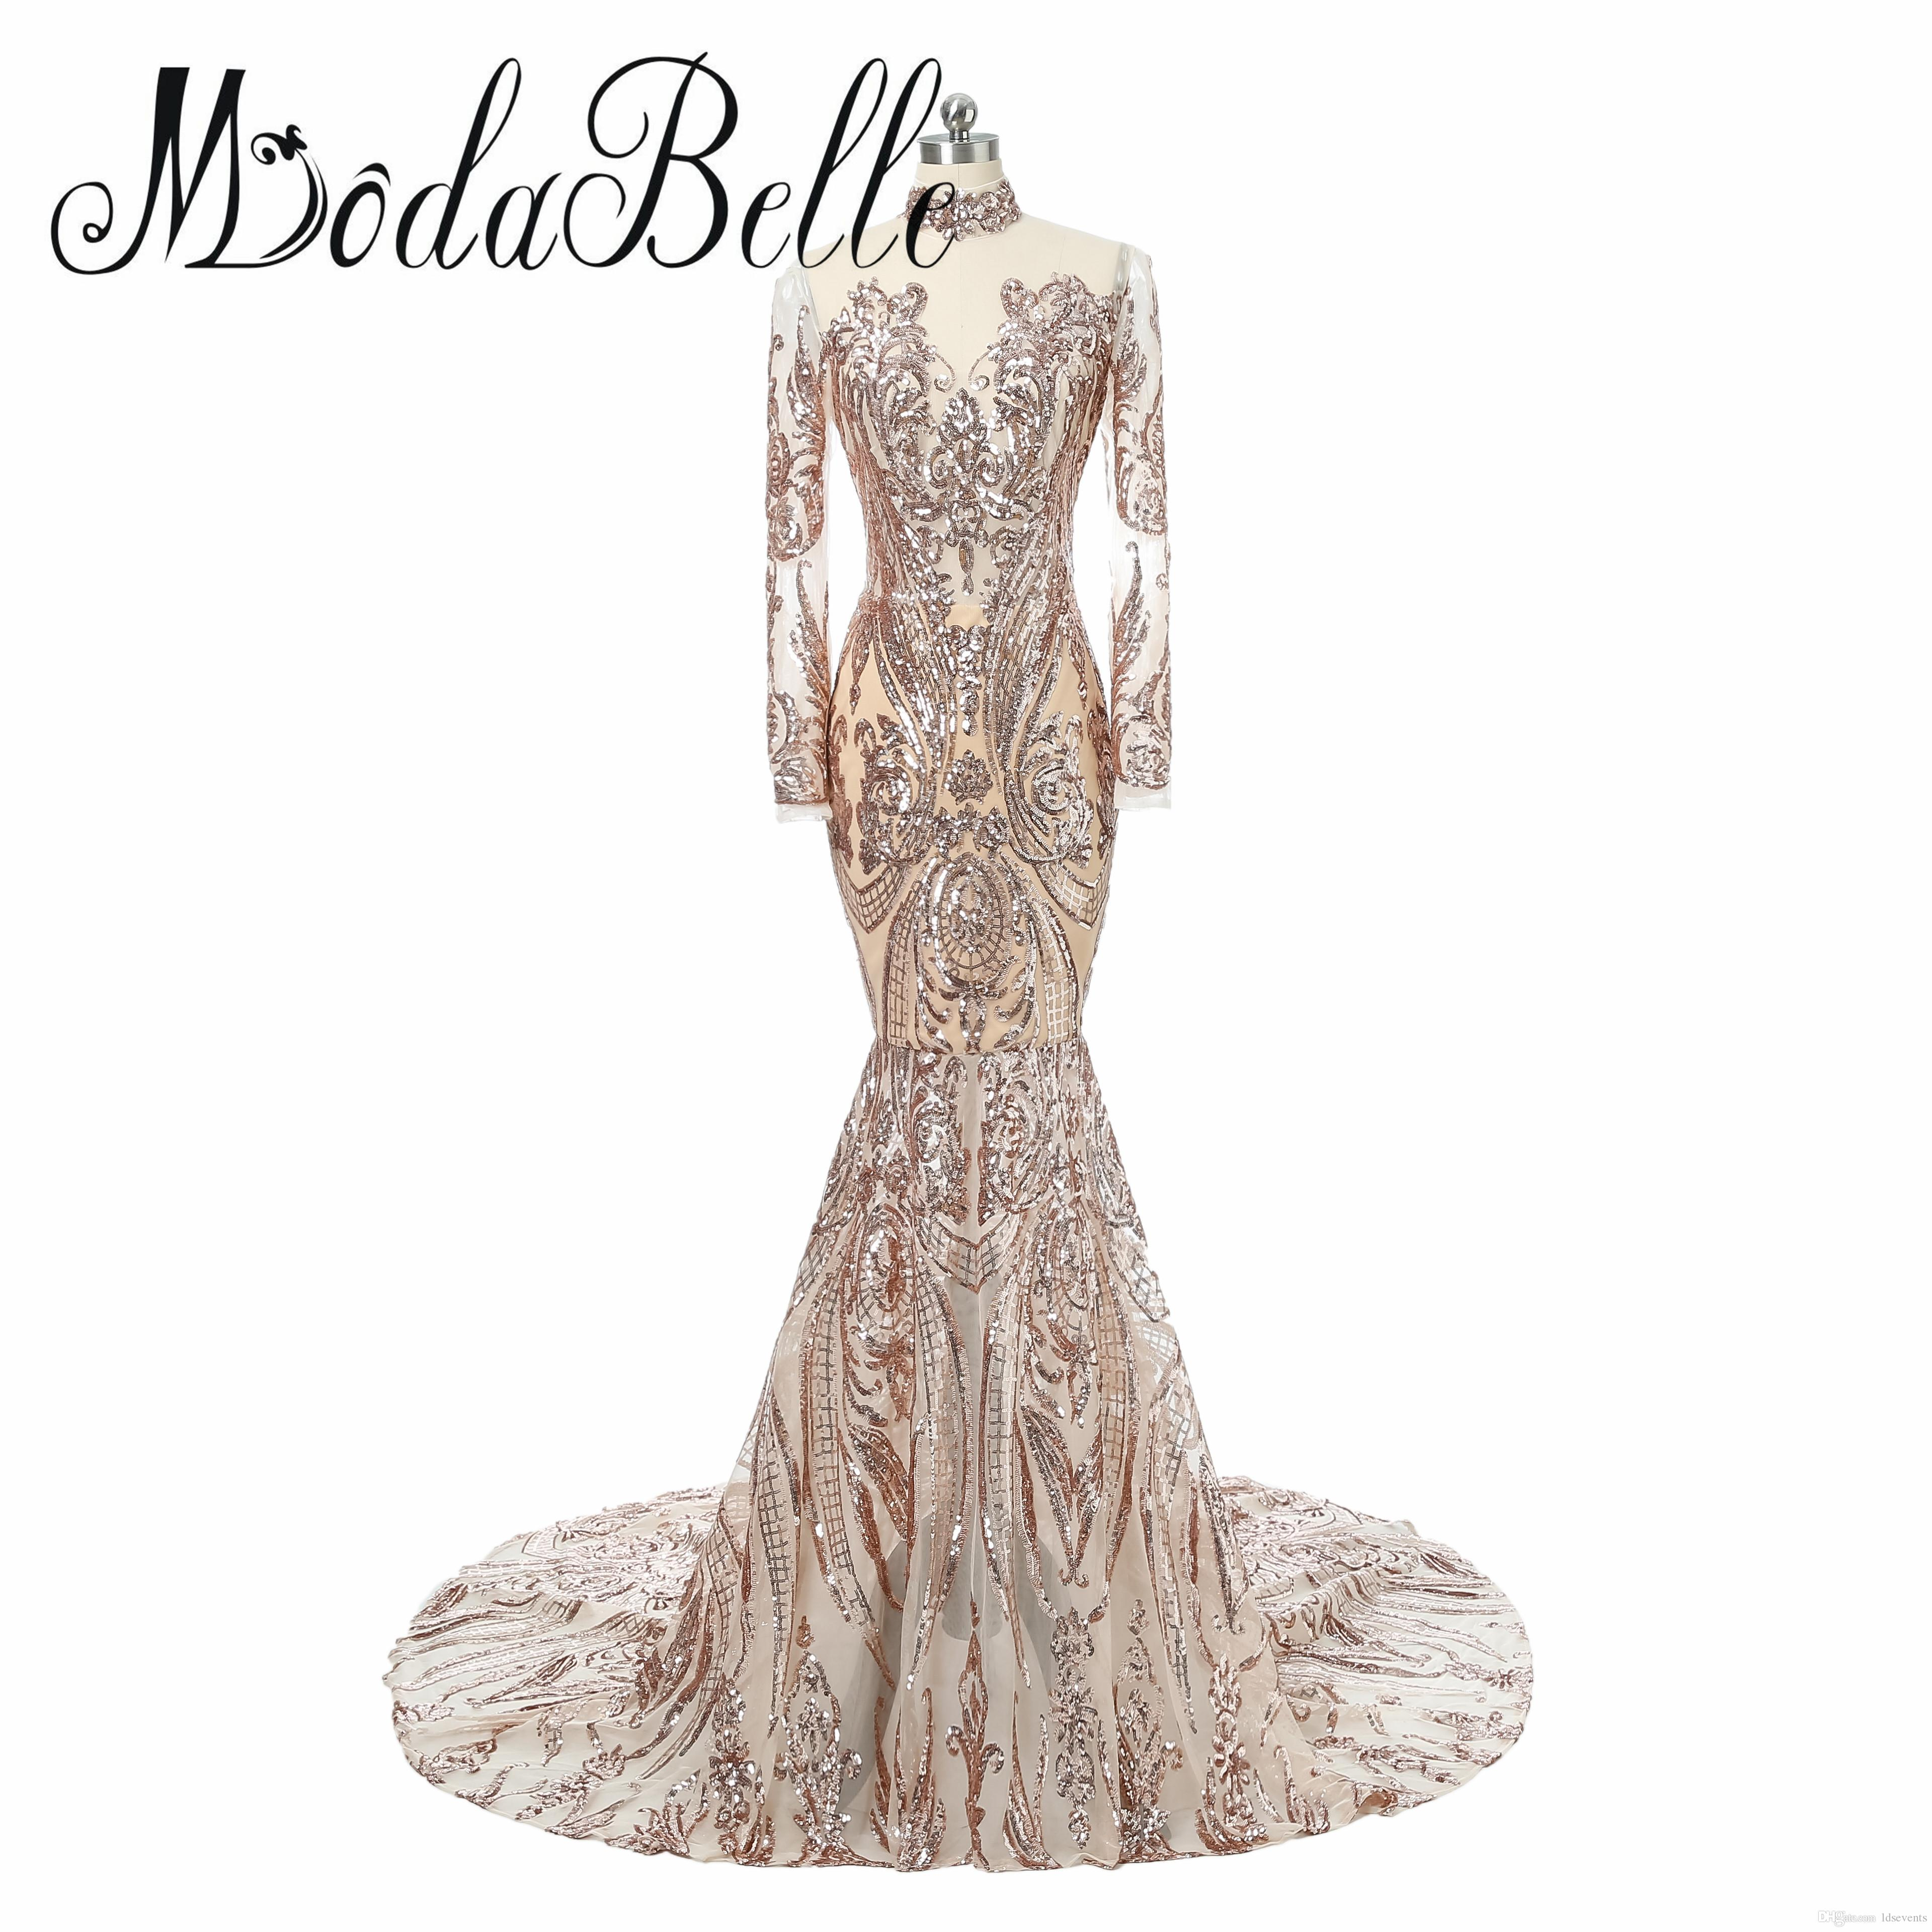 https://www.dhresource.com/0x0s/f2-albu-g4-M00-9E-E7-rBVaEVnLTeOAfos6AB2skMf_8RE219.jpg/new-fashion-long-sleeve-women-evening-dresses.jpg